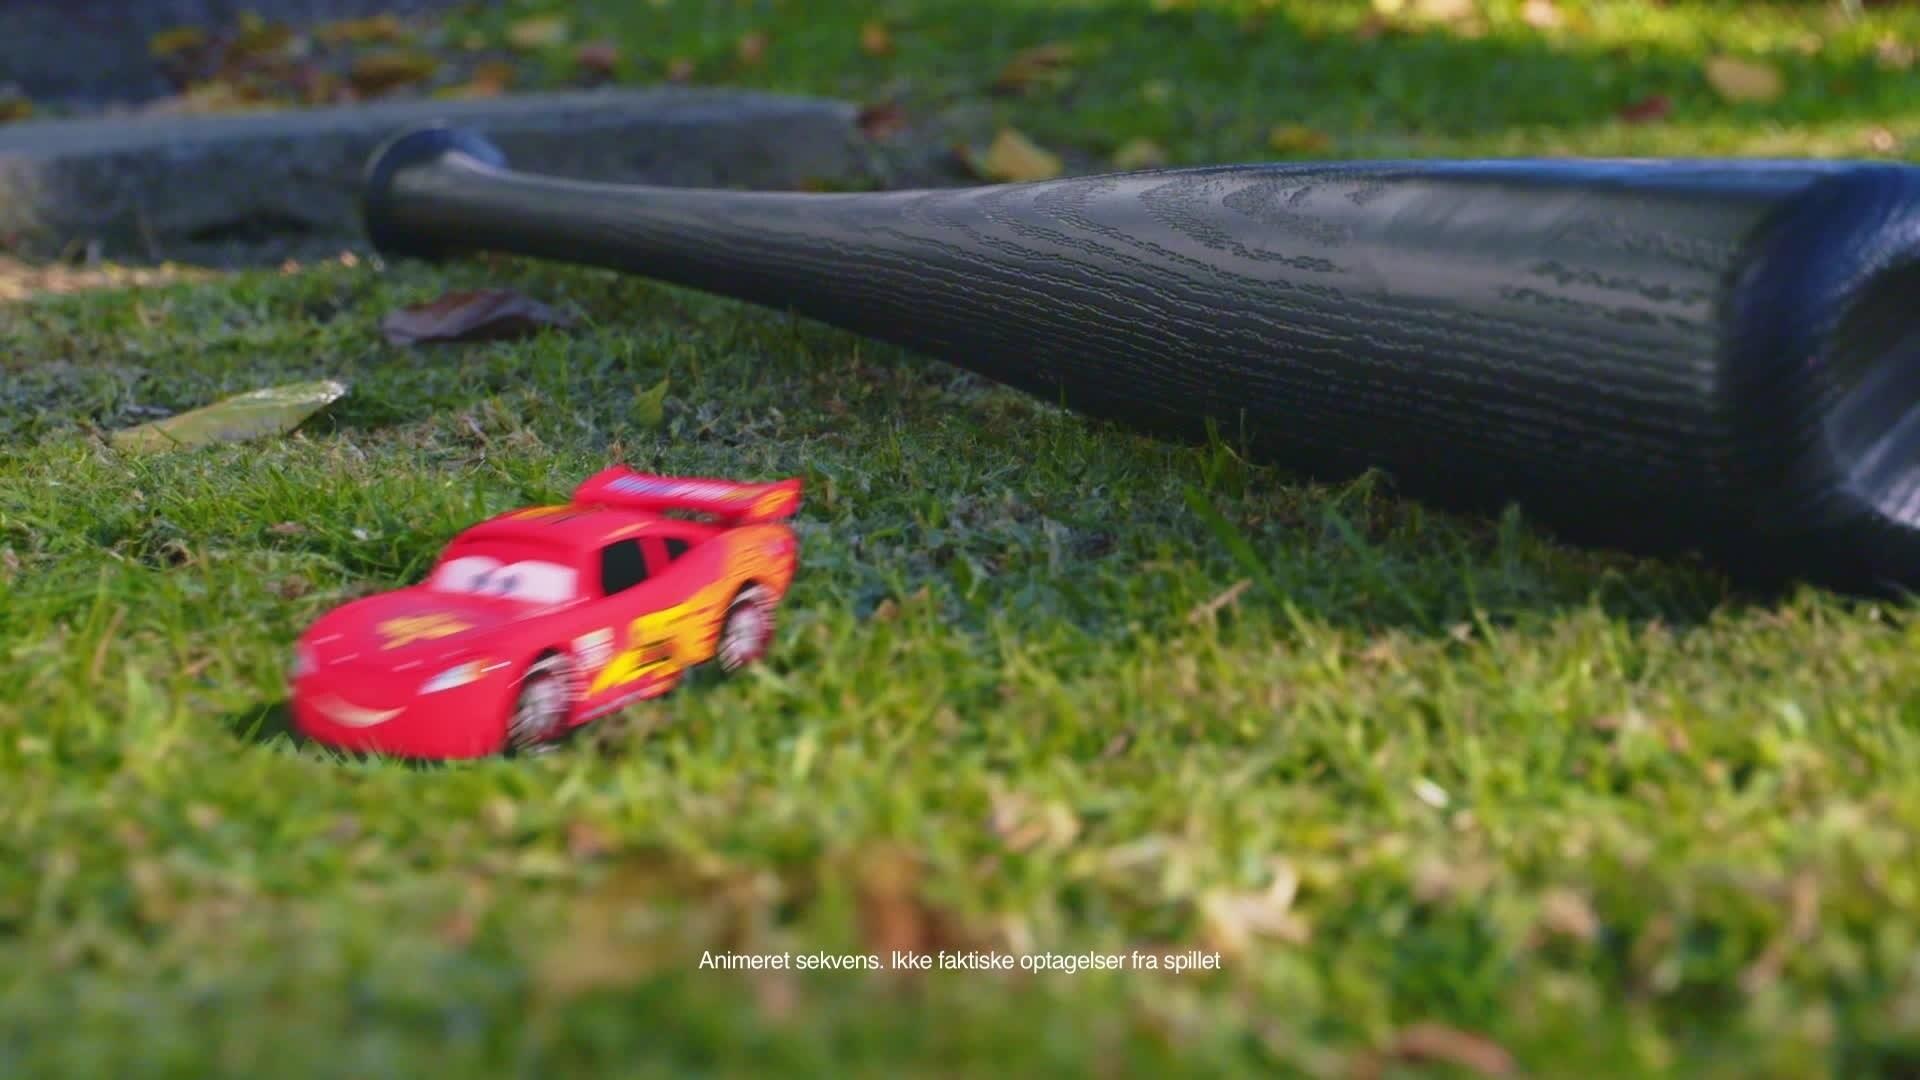 Fodboldkampen - Cars Daredevil Garage